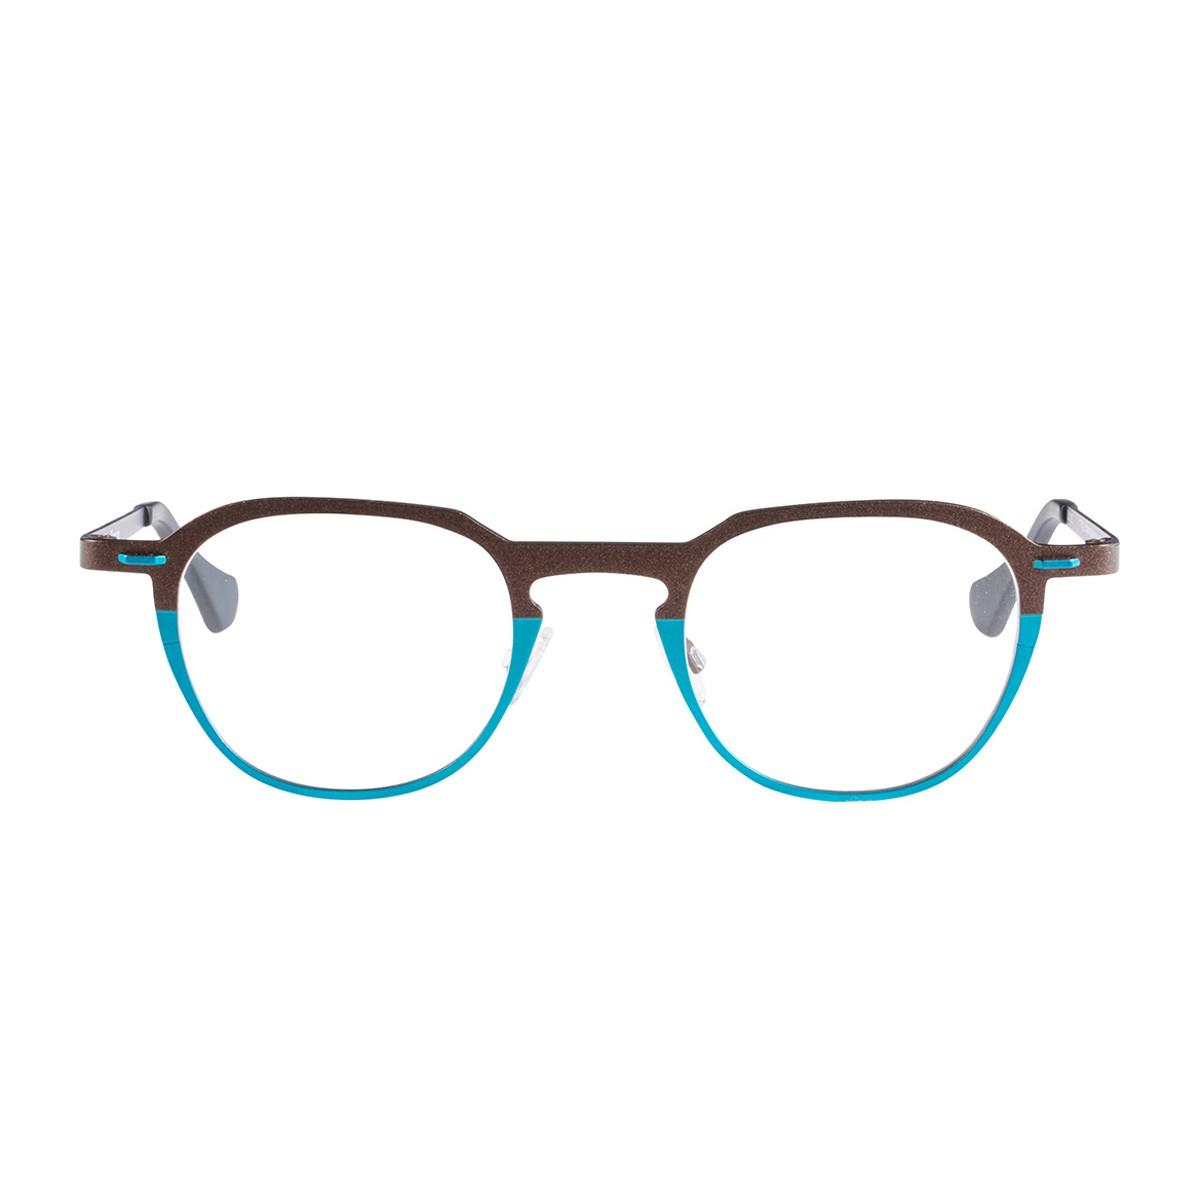 Matttew Papaya | Occhiali da vista Uomo